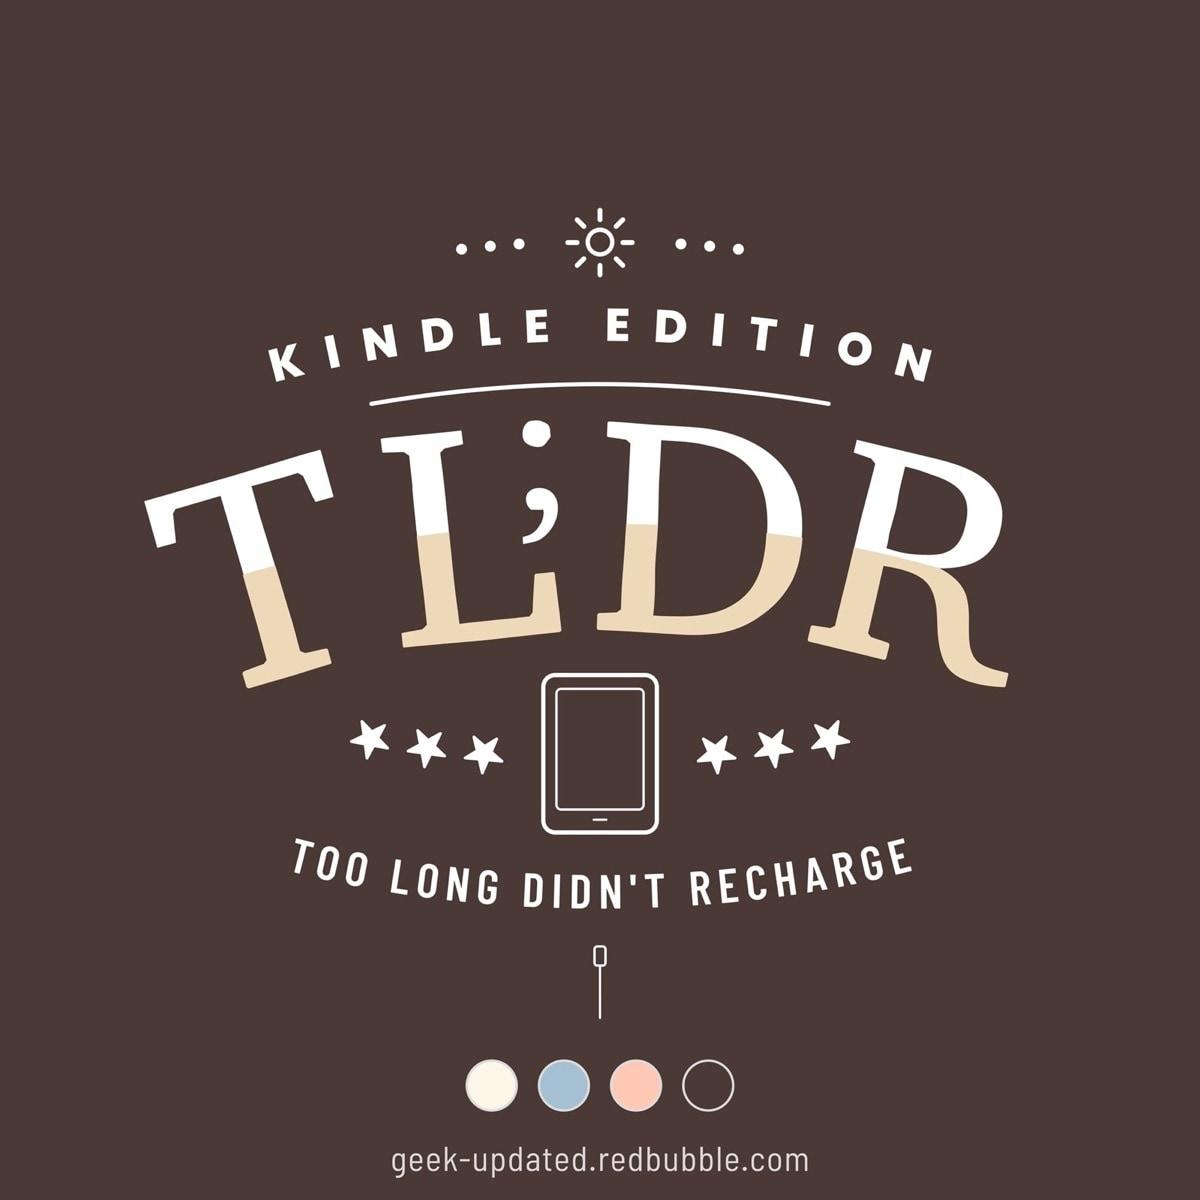 TL;DR Kindle edition - design by Piotr Kowalczyk